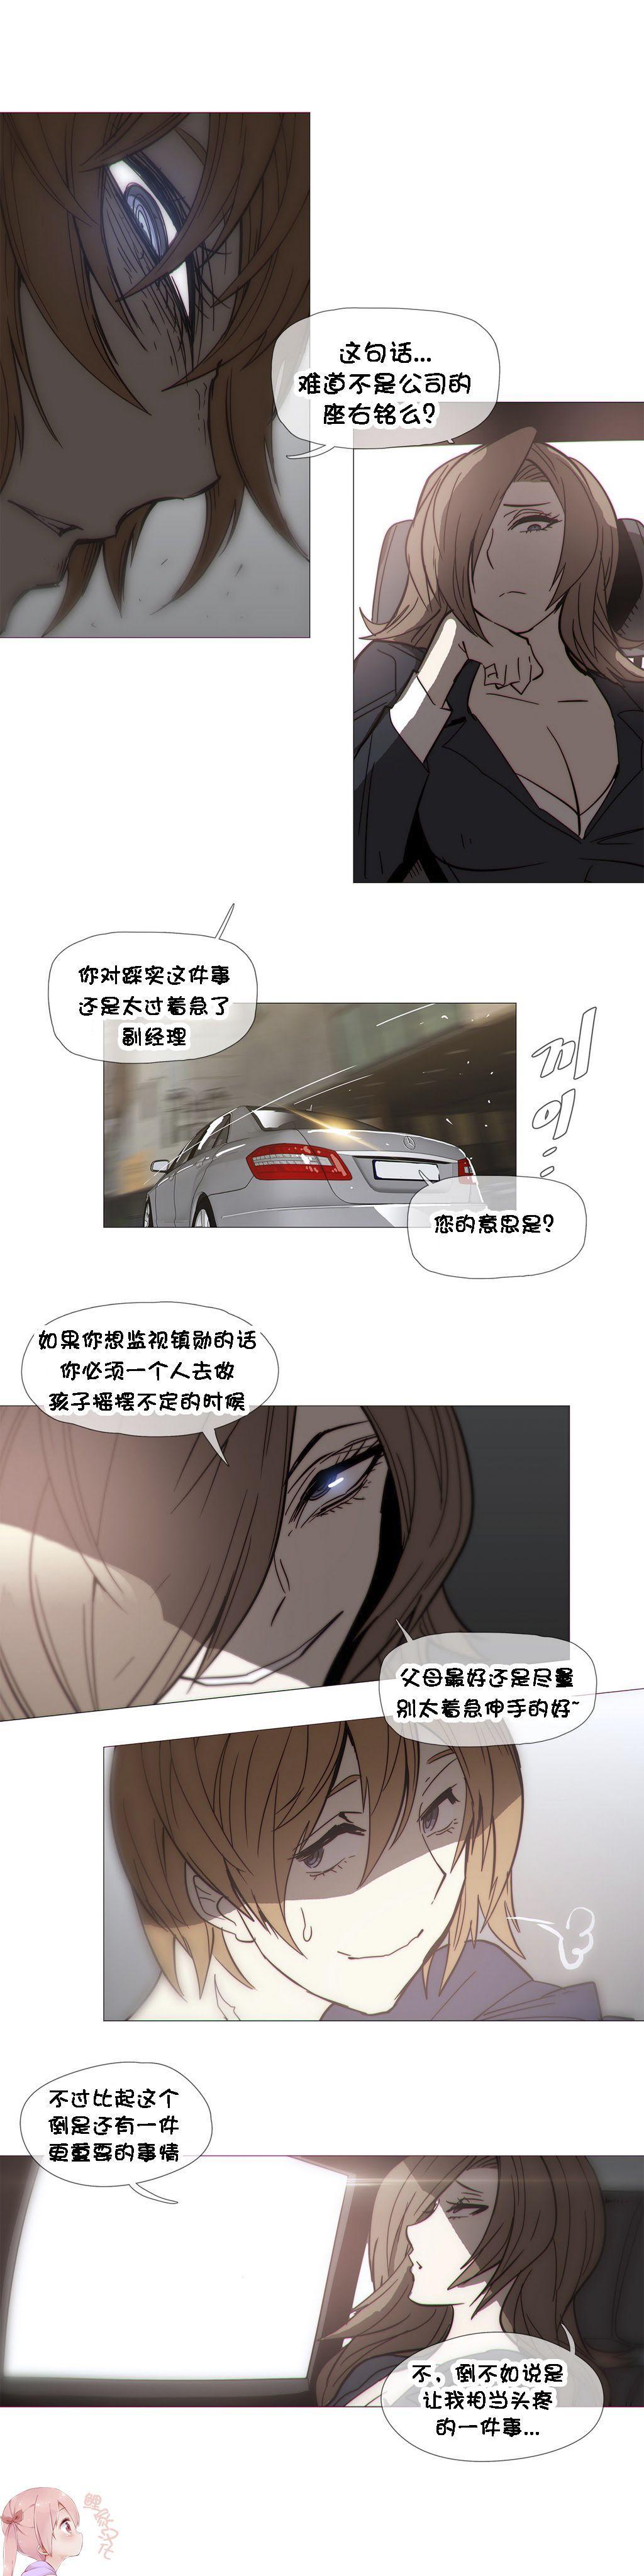 HouseHold Affairs 【卞赤鲤个人汉化】1~33话(持续更新中) 670